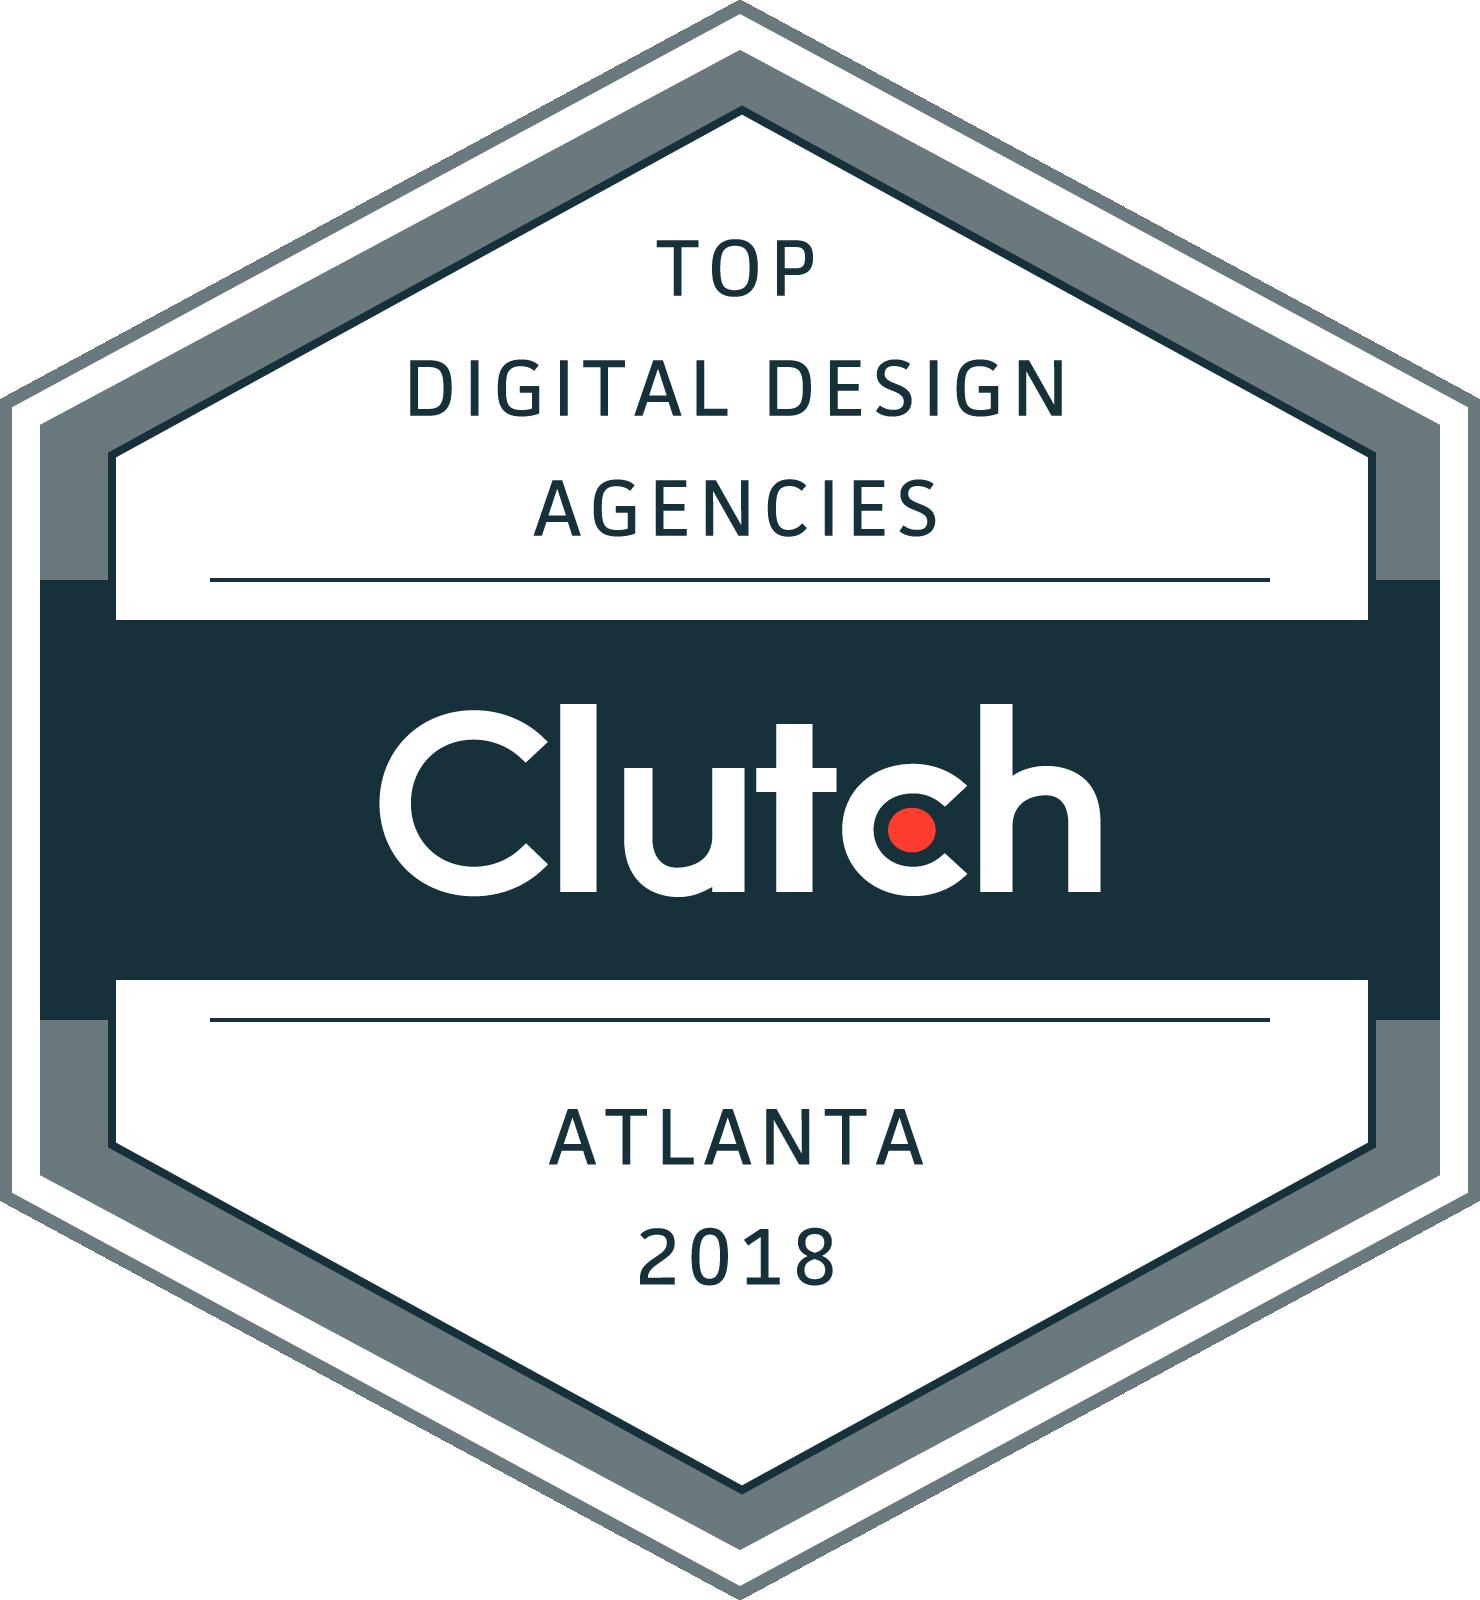 Digital_Design_Agencies_Atlanta_2018.png